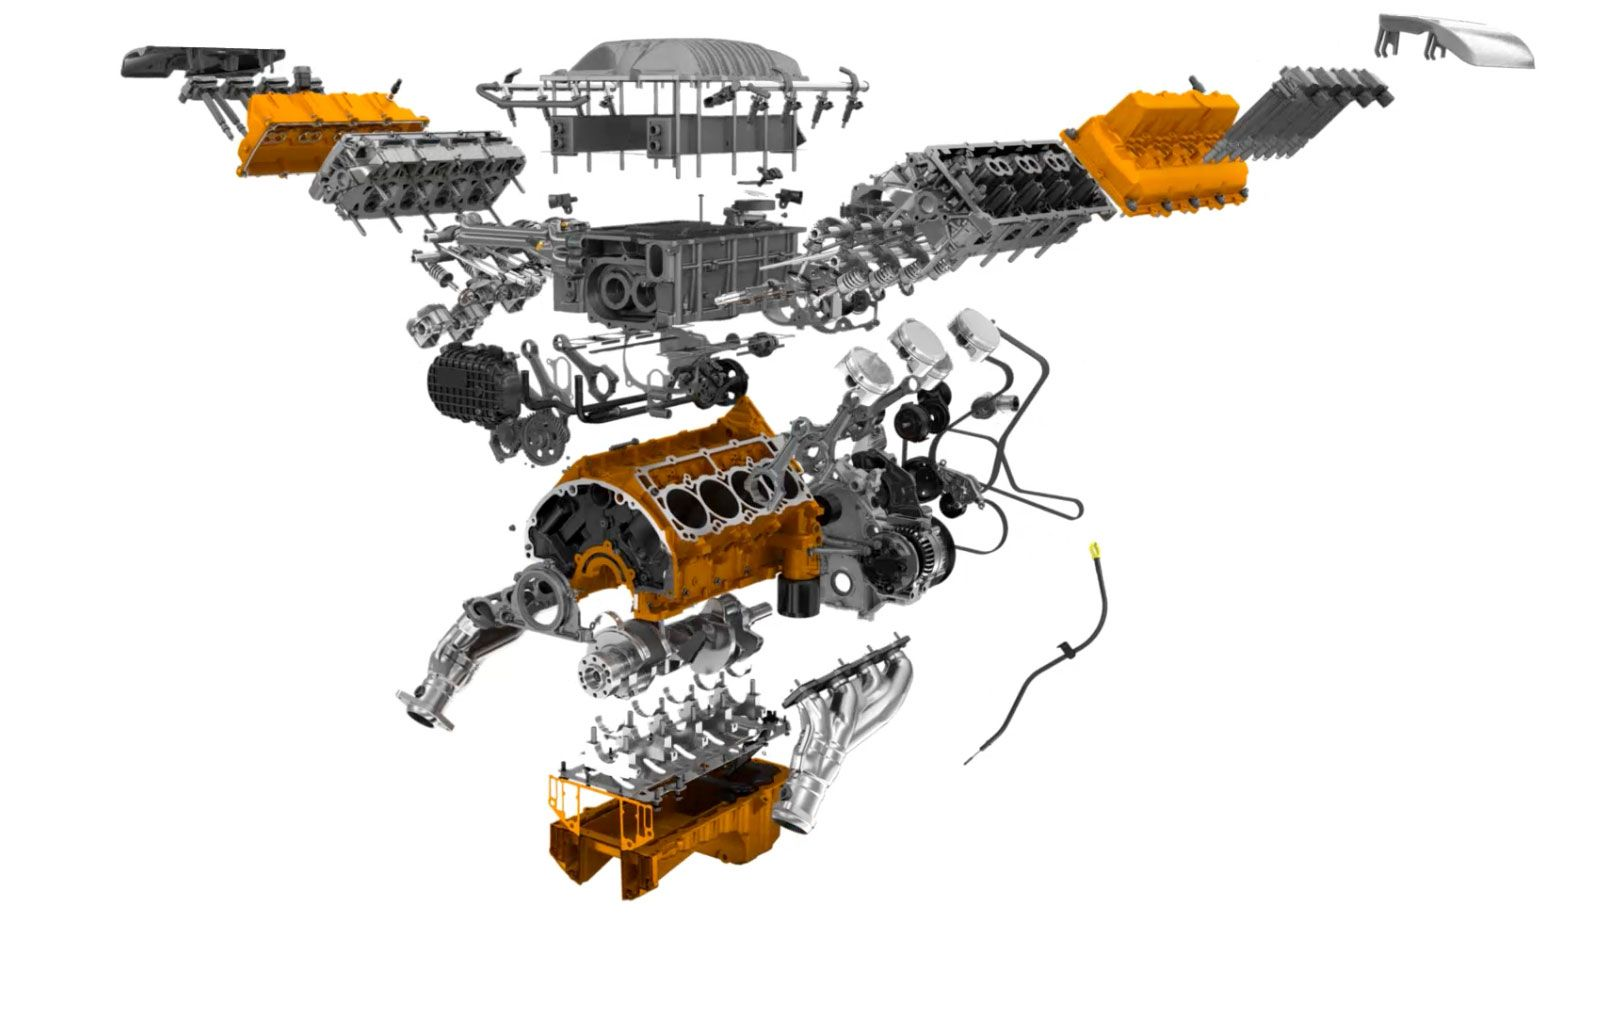 2015 challenger hemi engine diagram wiring diagram mega 2015 dodge challenger engine diagram 707 hp 6 [ 1600 x 1031 Pixel ]